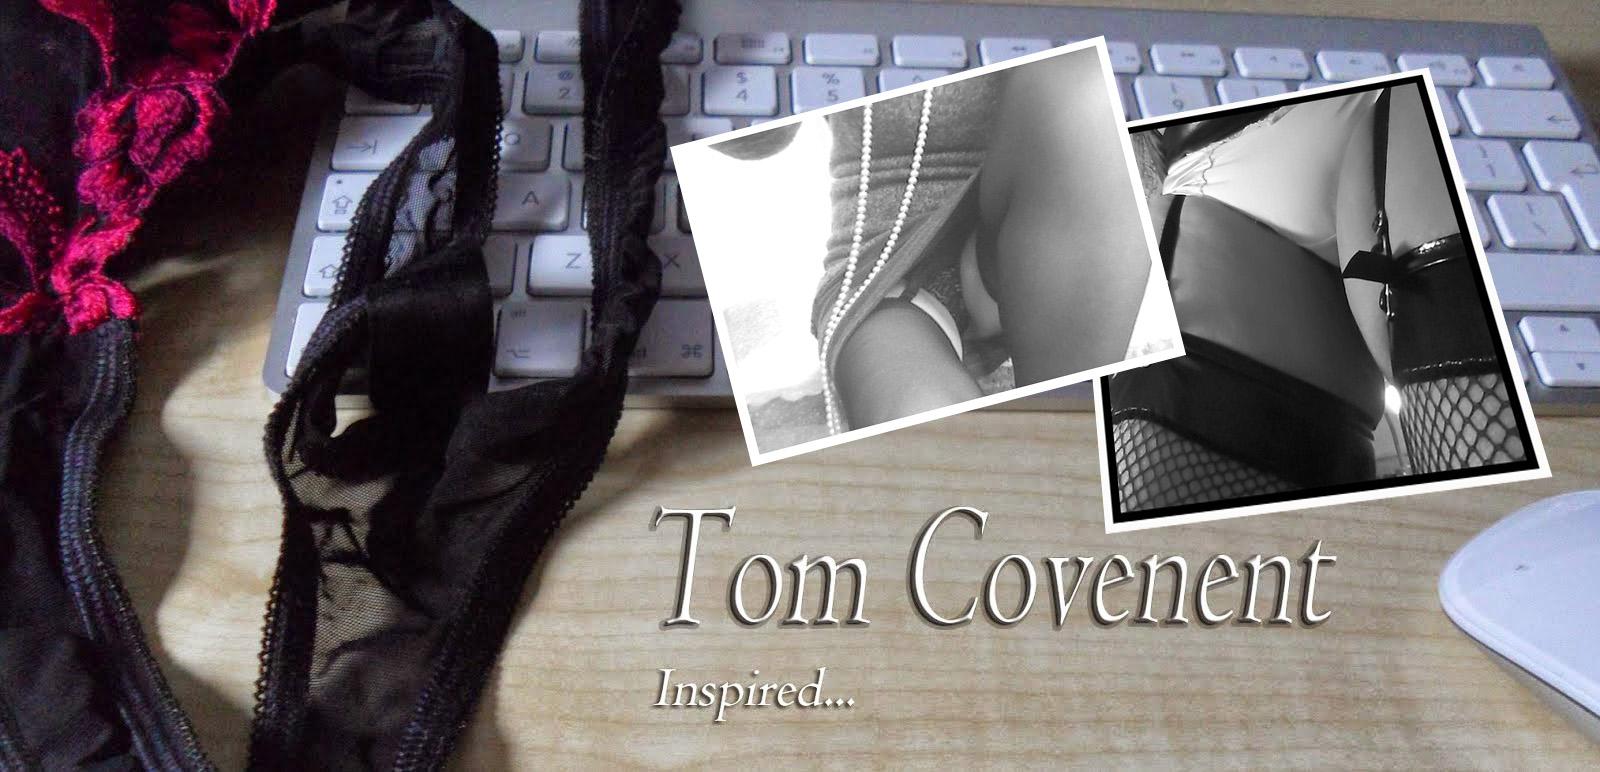 Tom Covenent